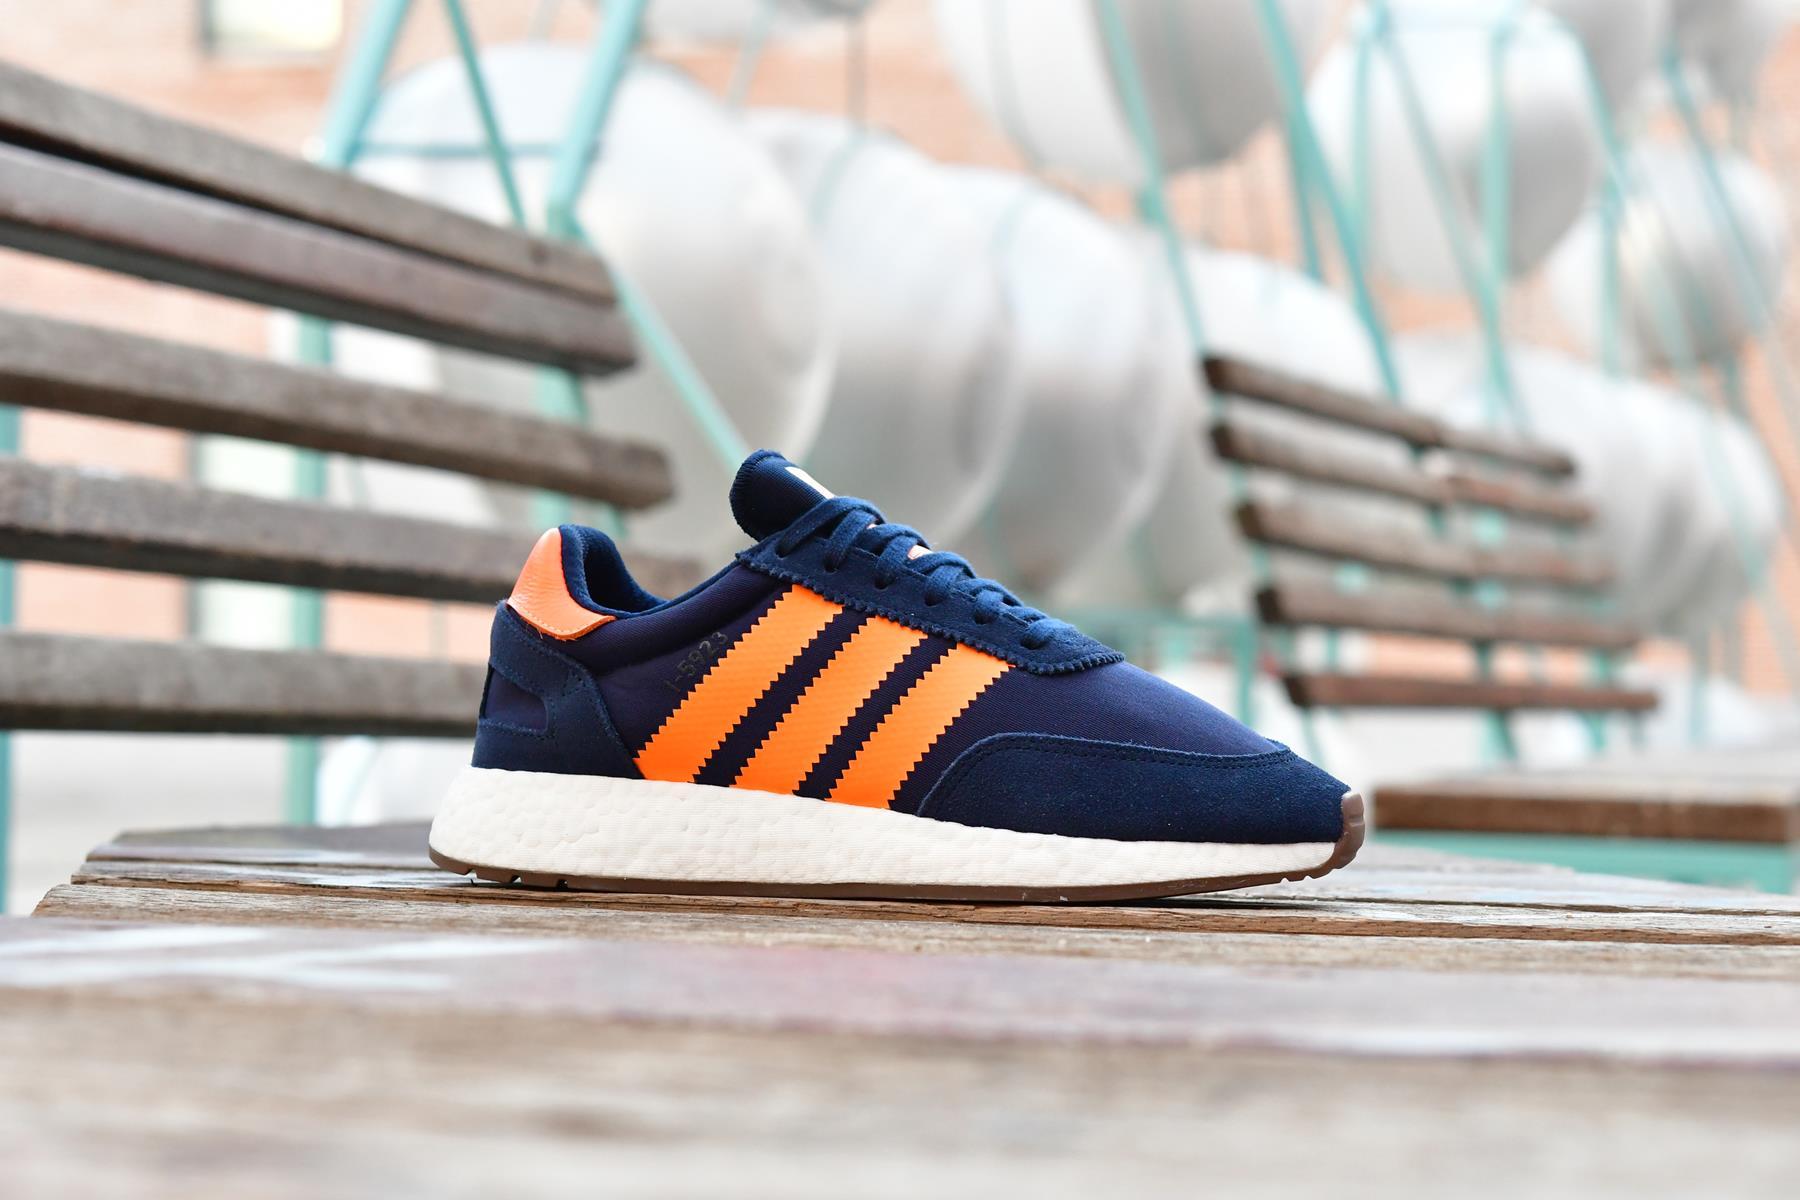 B37919_AmorShoes-Adidas-Originals-Iniki-Runner-I-5923-Collegiate-Navy-Gum-5-Grey-Five-zapatilla-Azul-Marino-rayas-naranja-orange-suela-boost-B37919